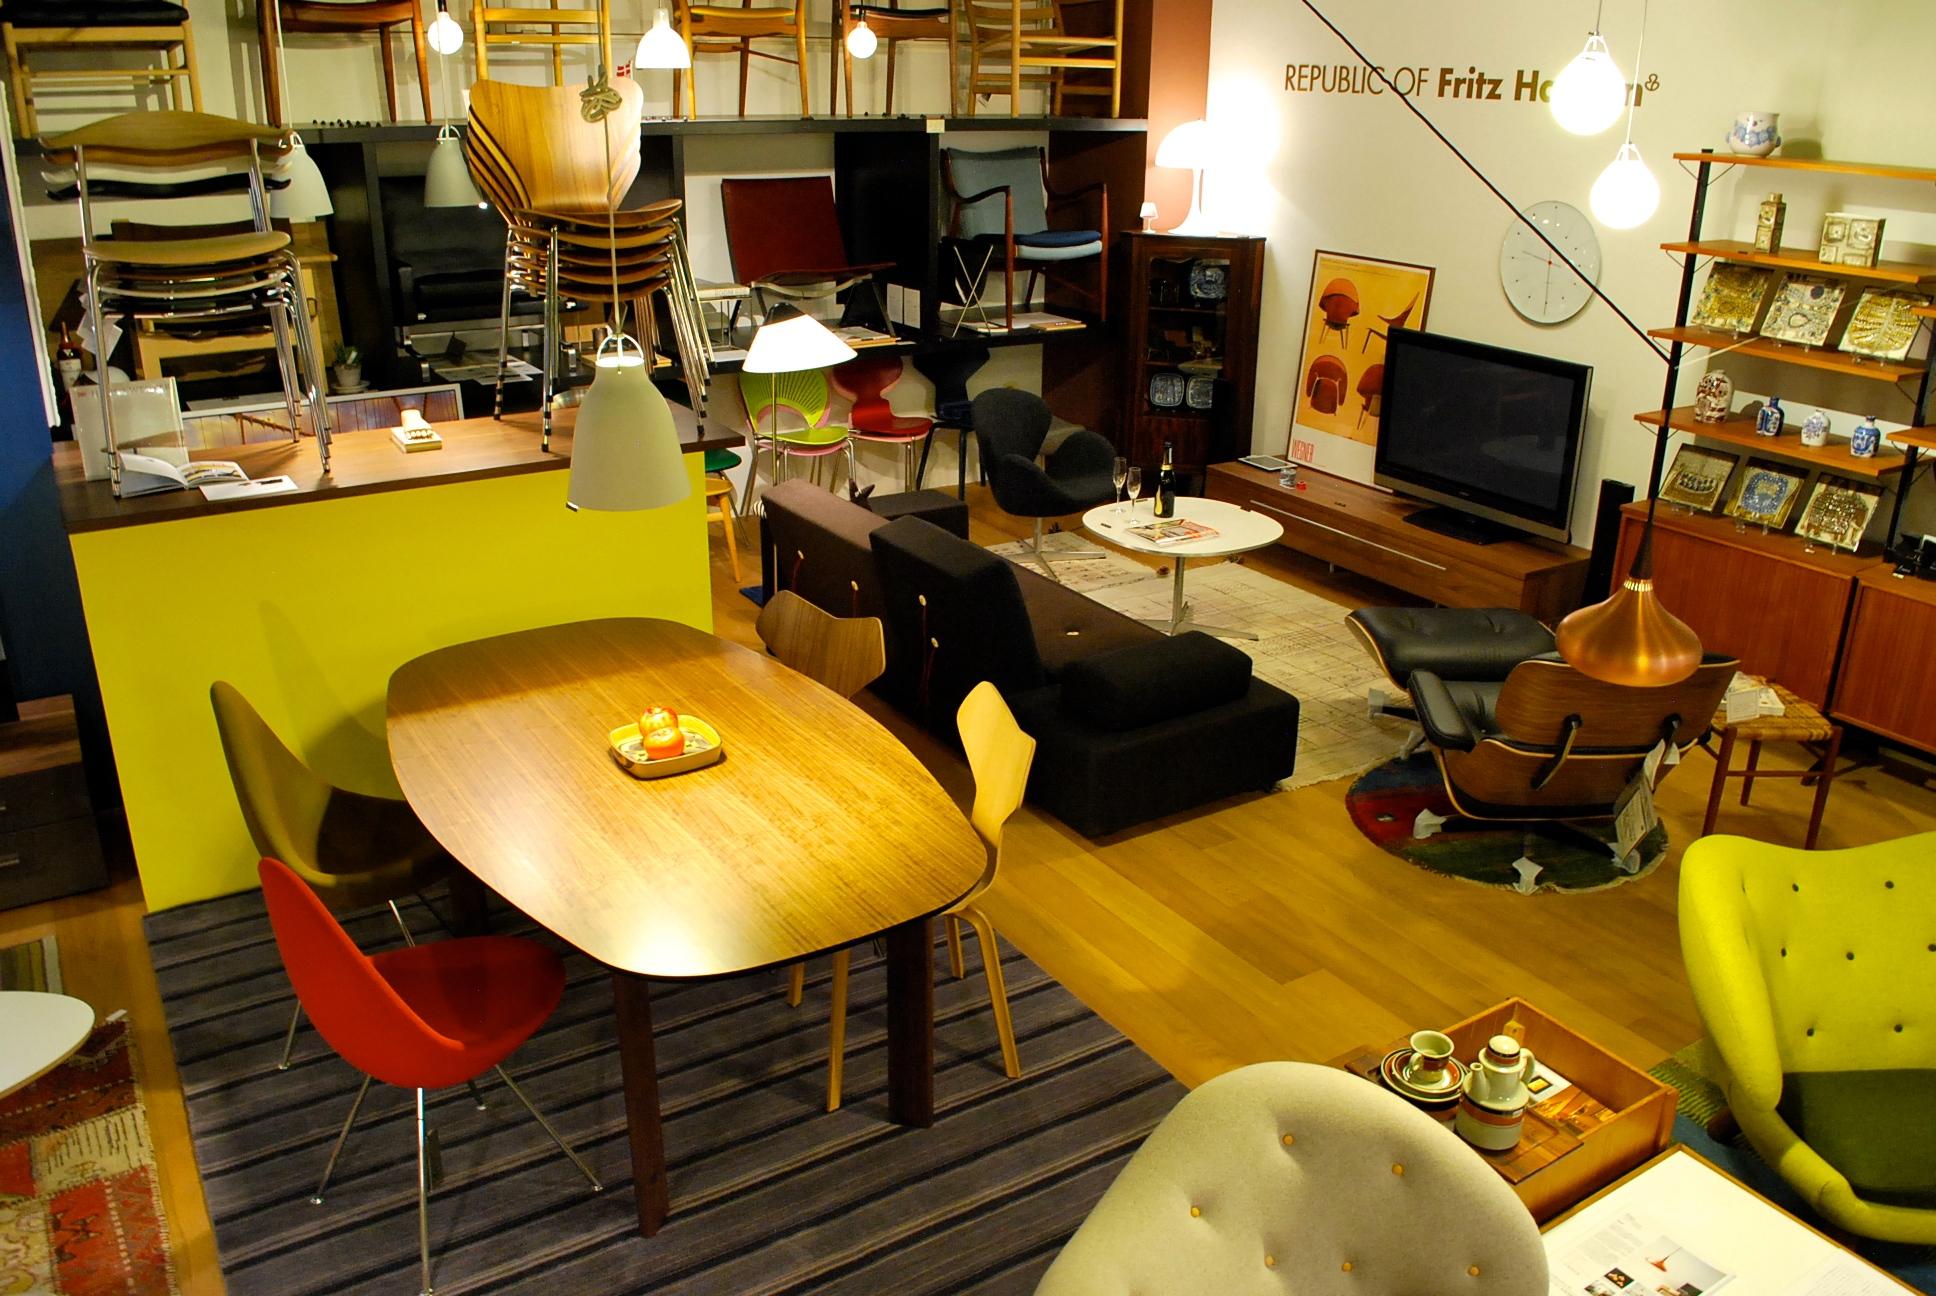 http://www.sora-design.com/images/bl-3155.JPG